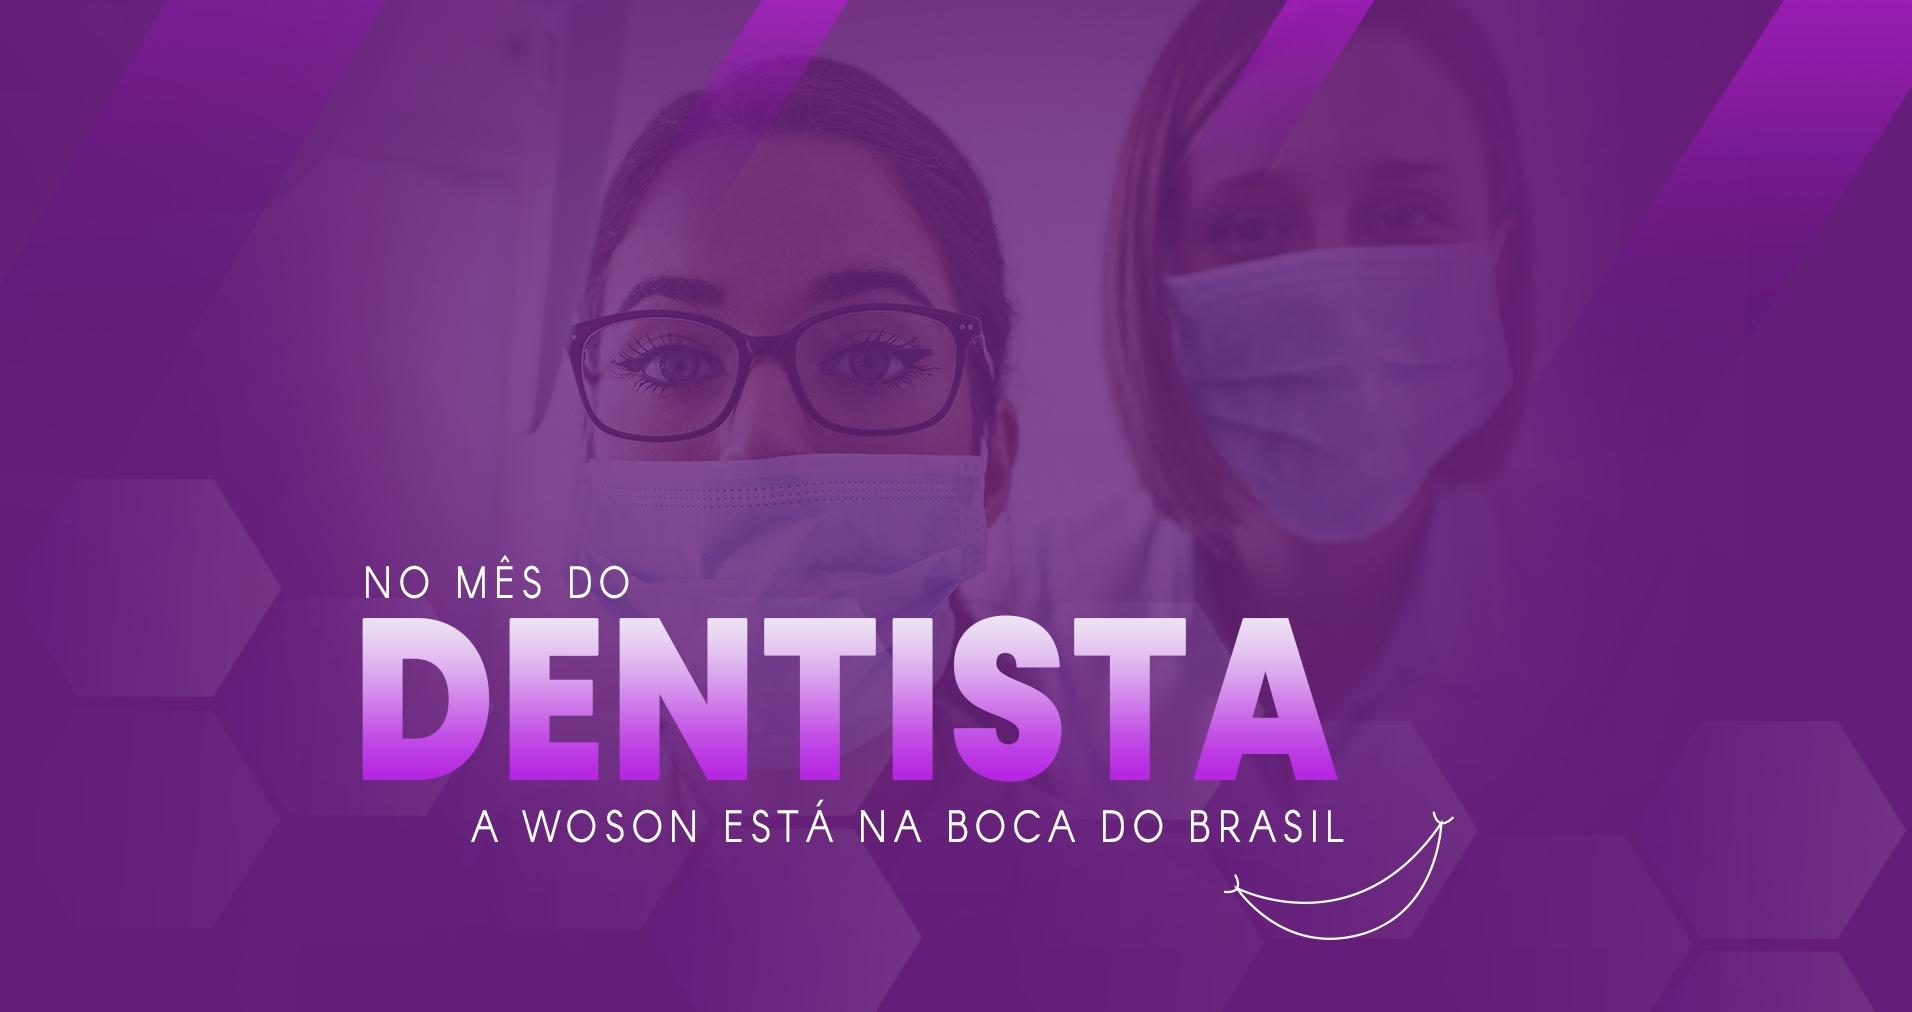 WOSON NA BOCA DO BRASIL